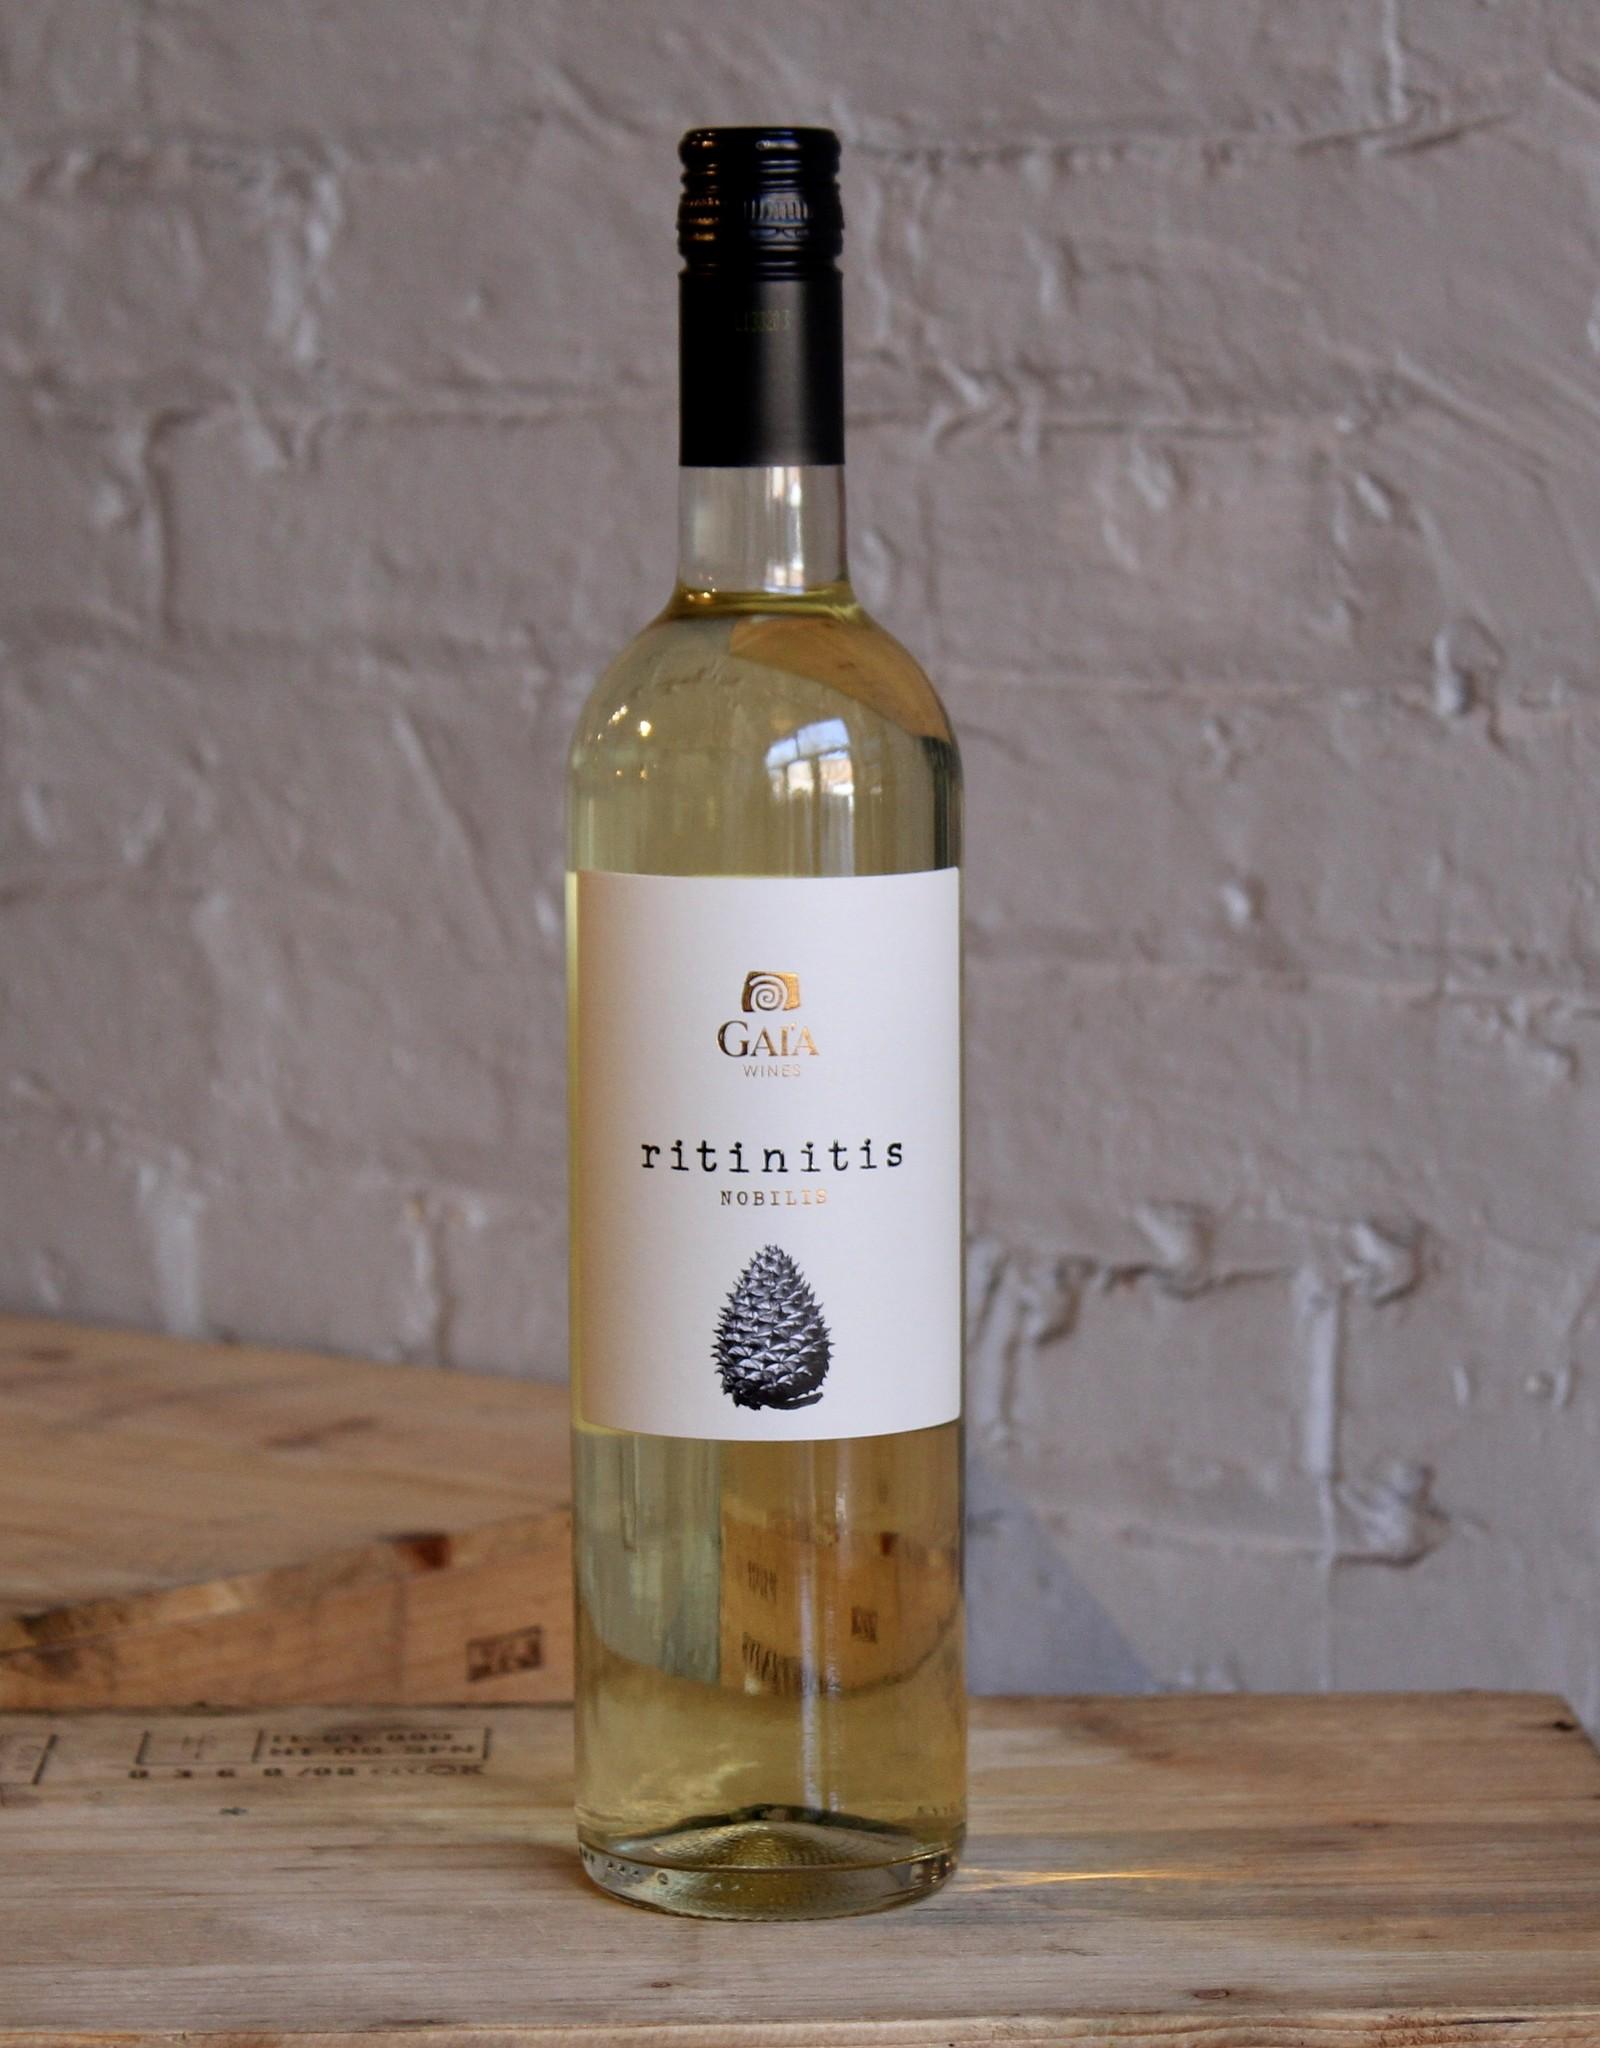 Wine NV Gai'a Ritinitis Nobilis Retsina - Aegiali, Greece (750ml)